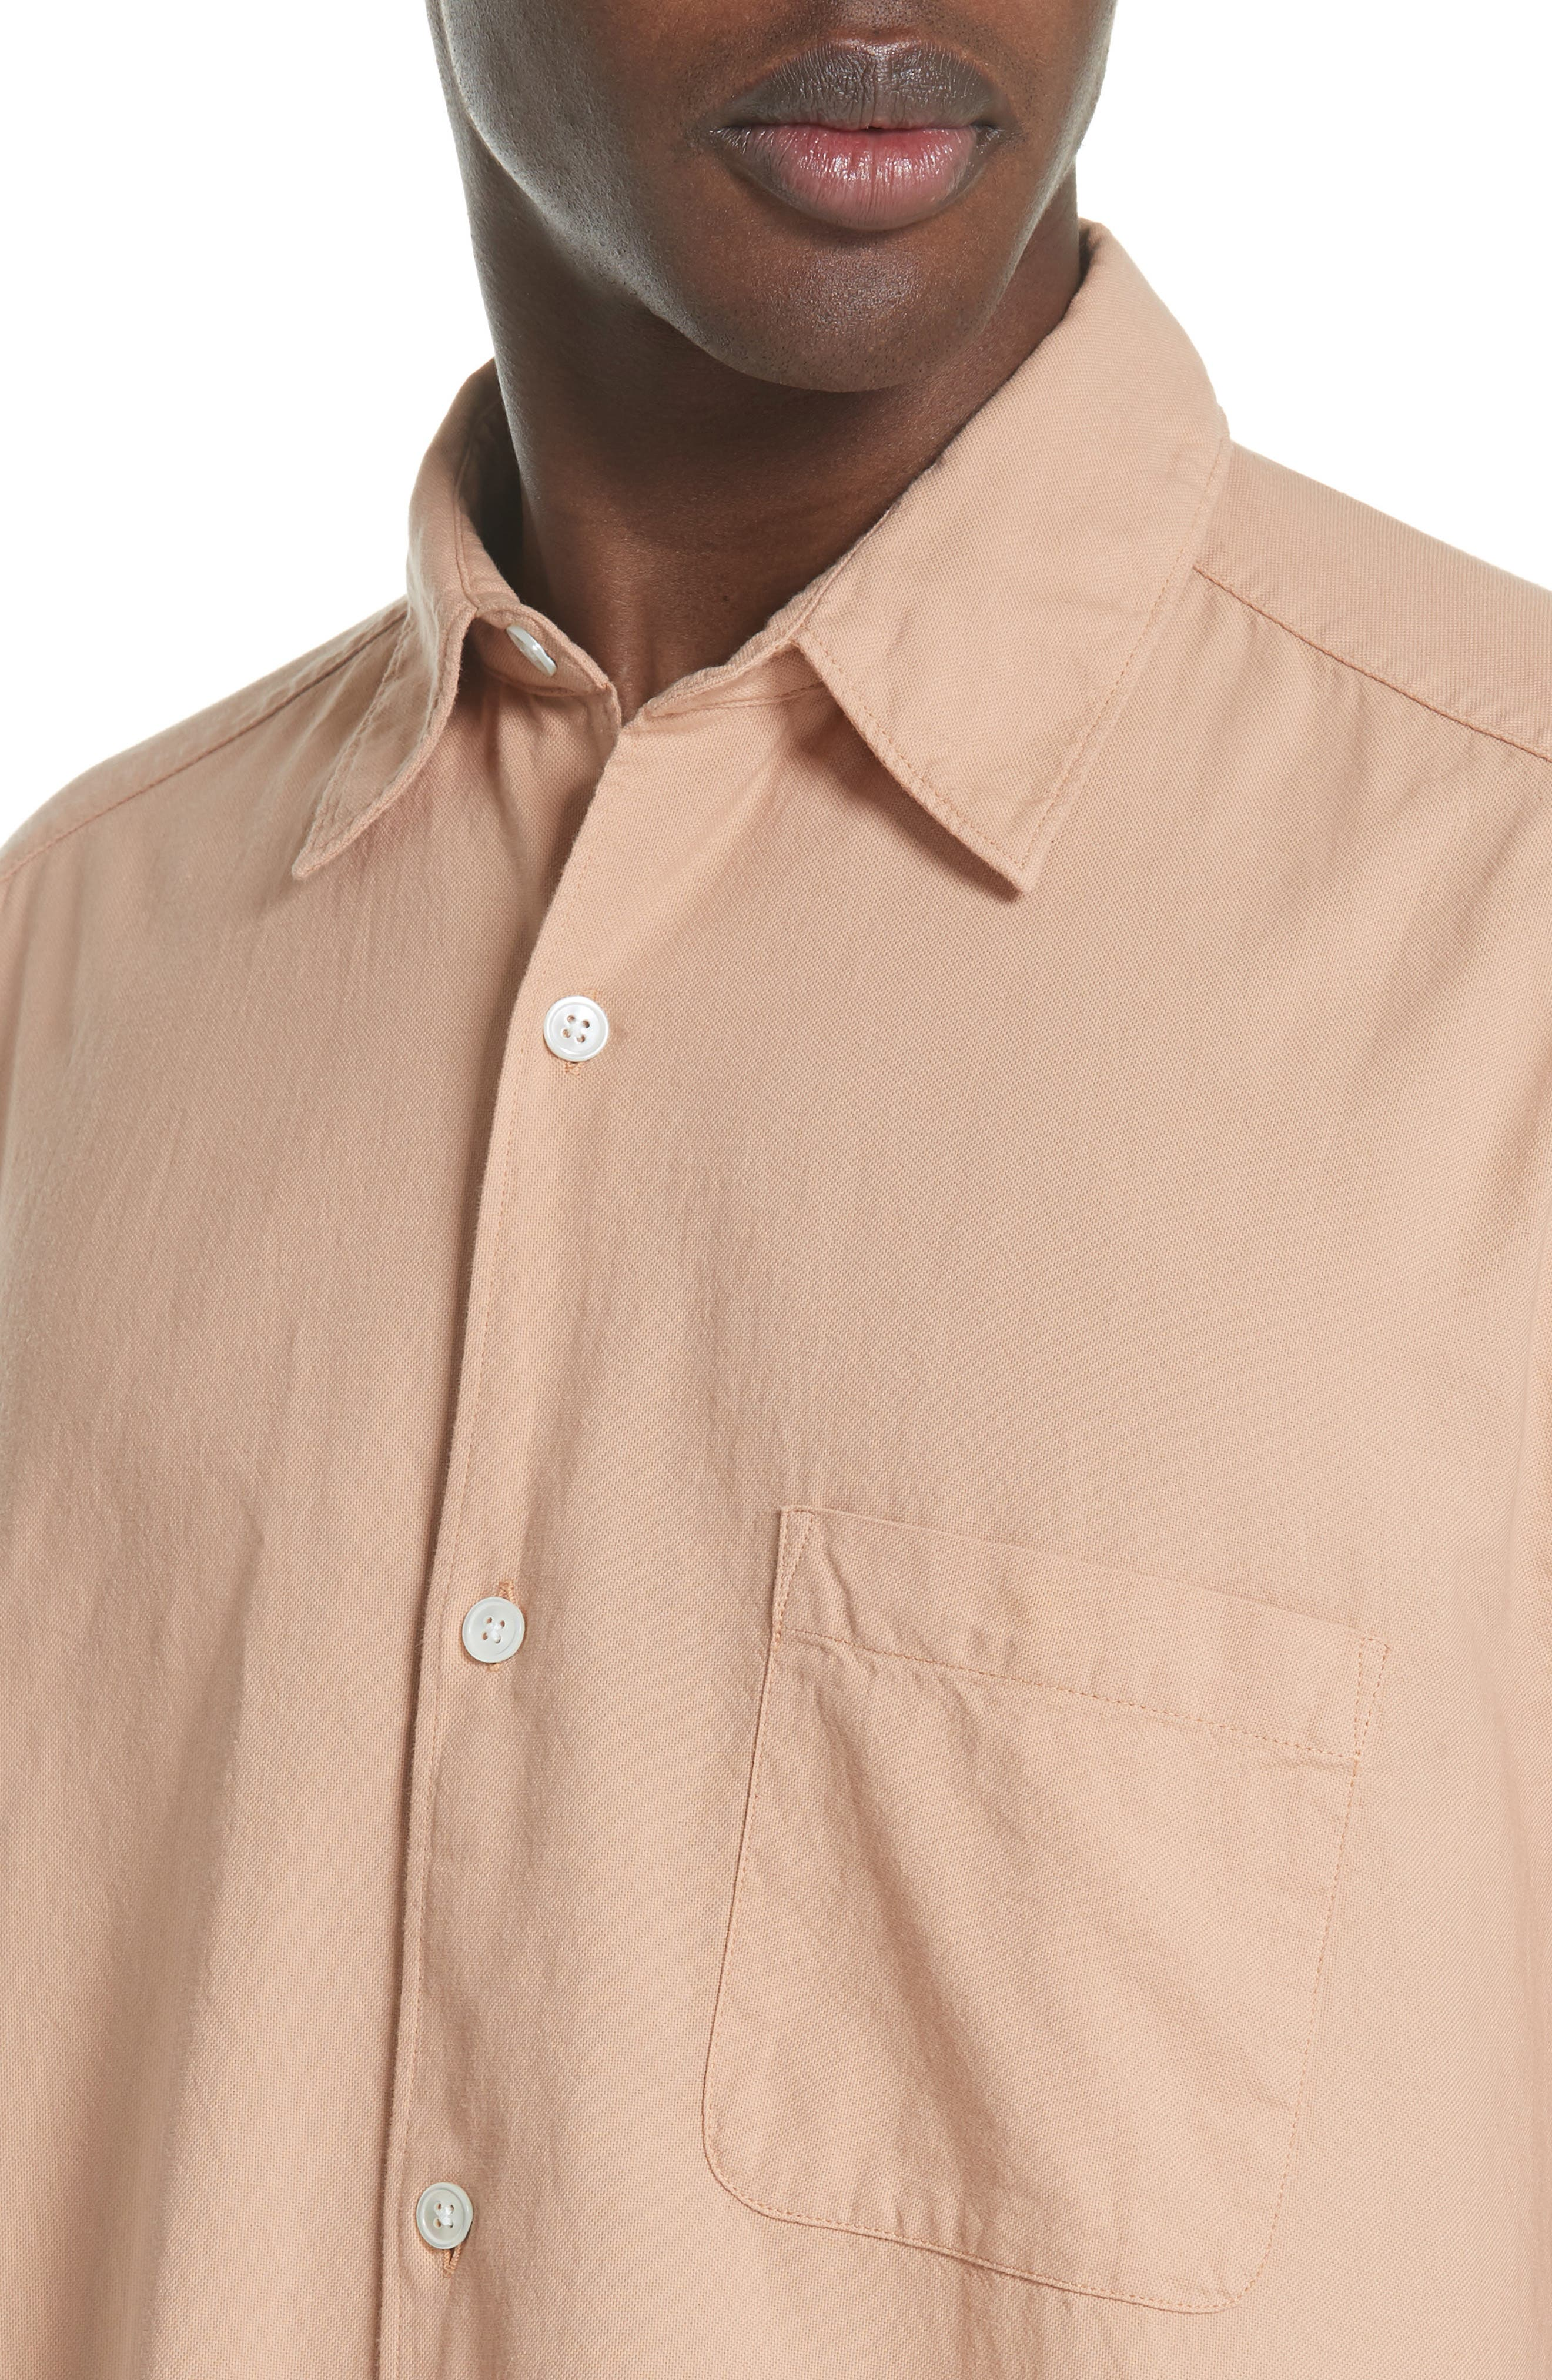 Oversize Basketweave Shirt,                             Alternate thumbnail 4, color,                             680